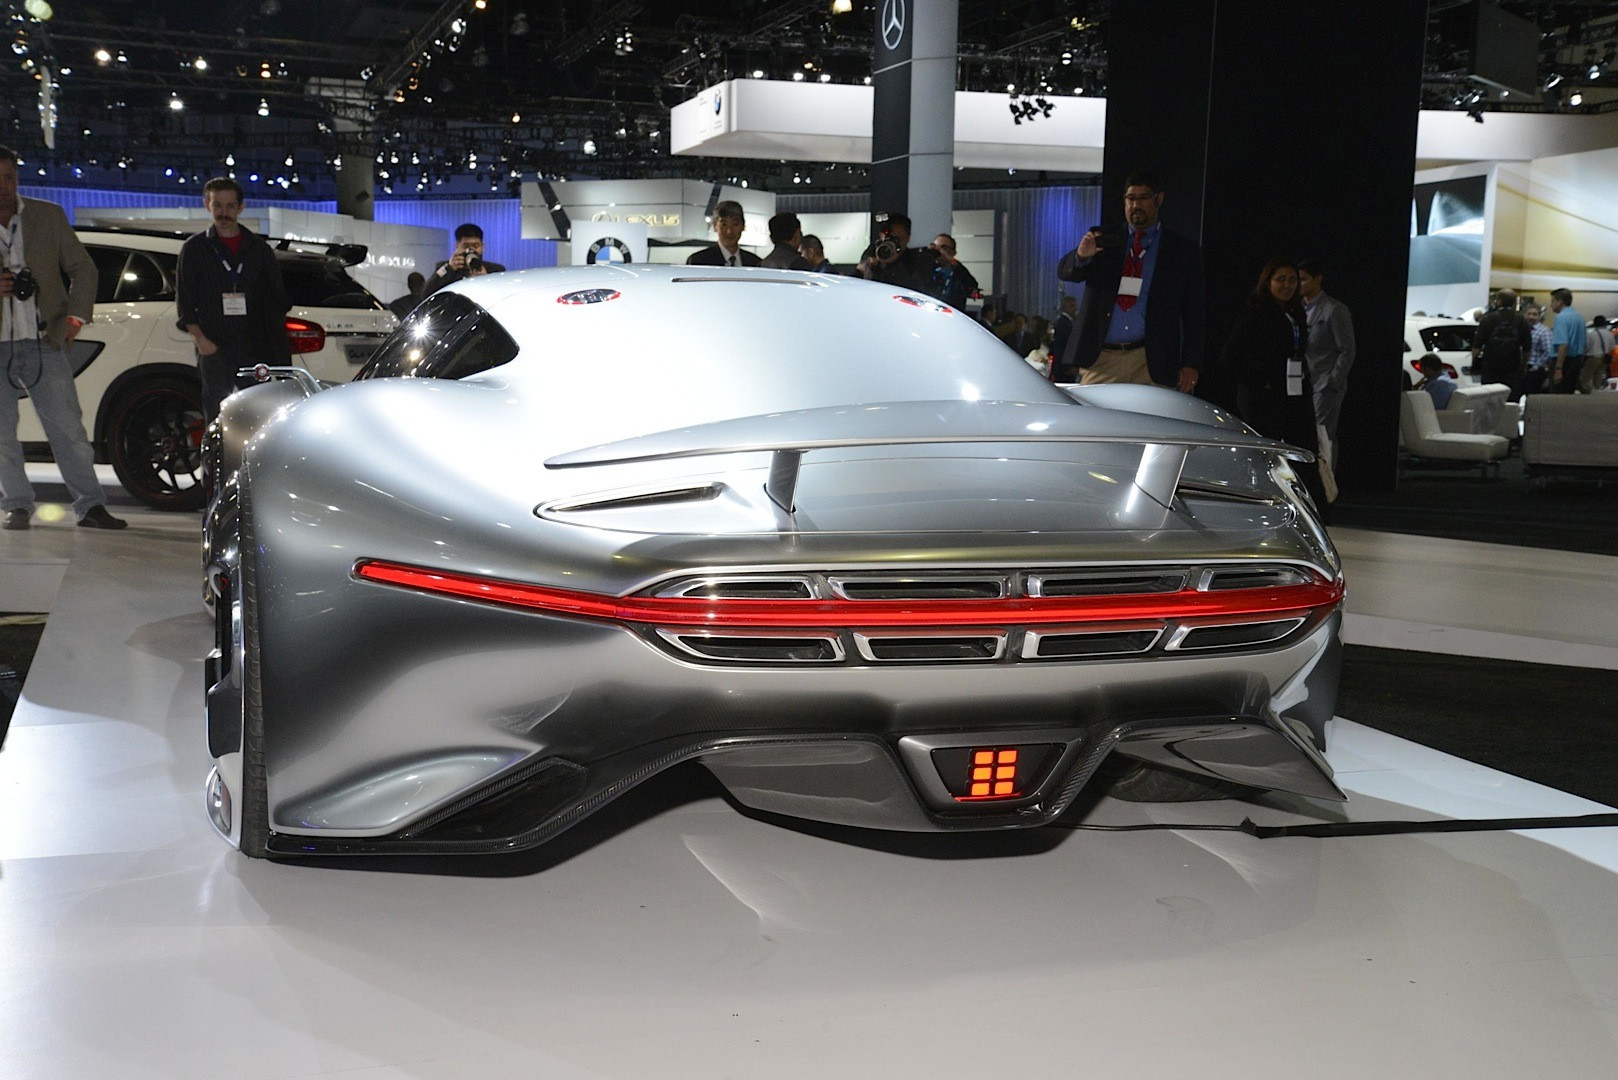 Mercedes Benz AMG Vision Gran Turismo Looks Badass Live As